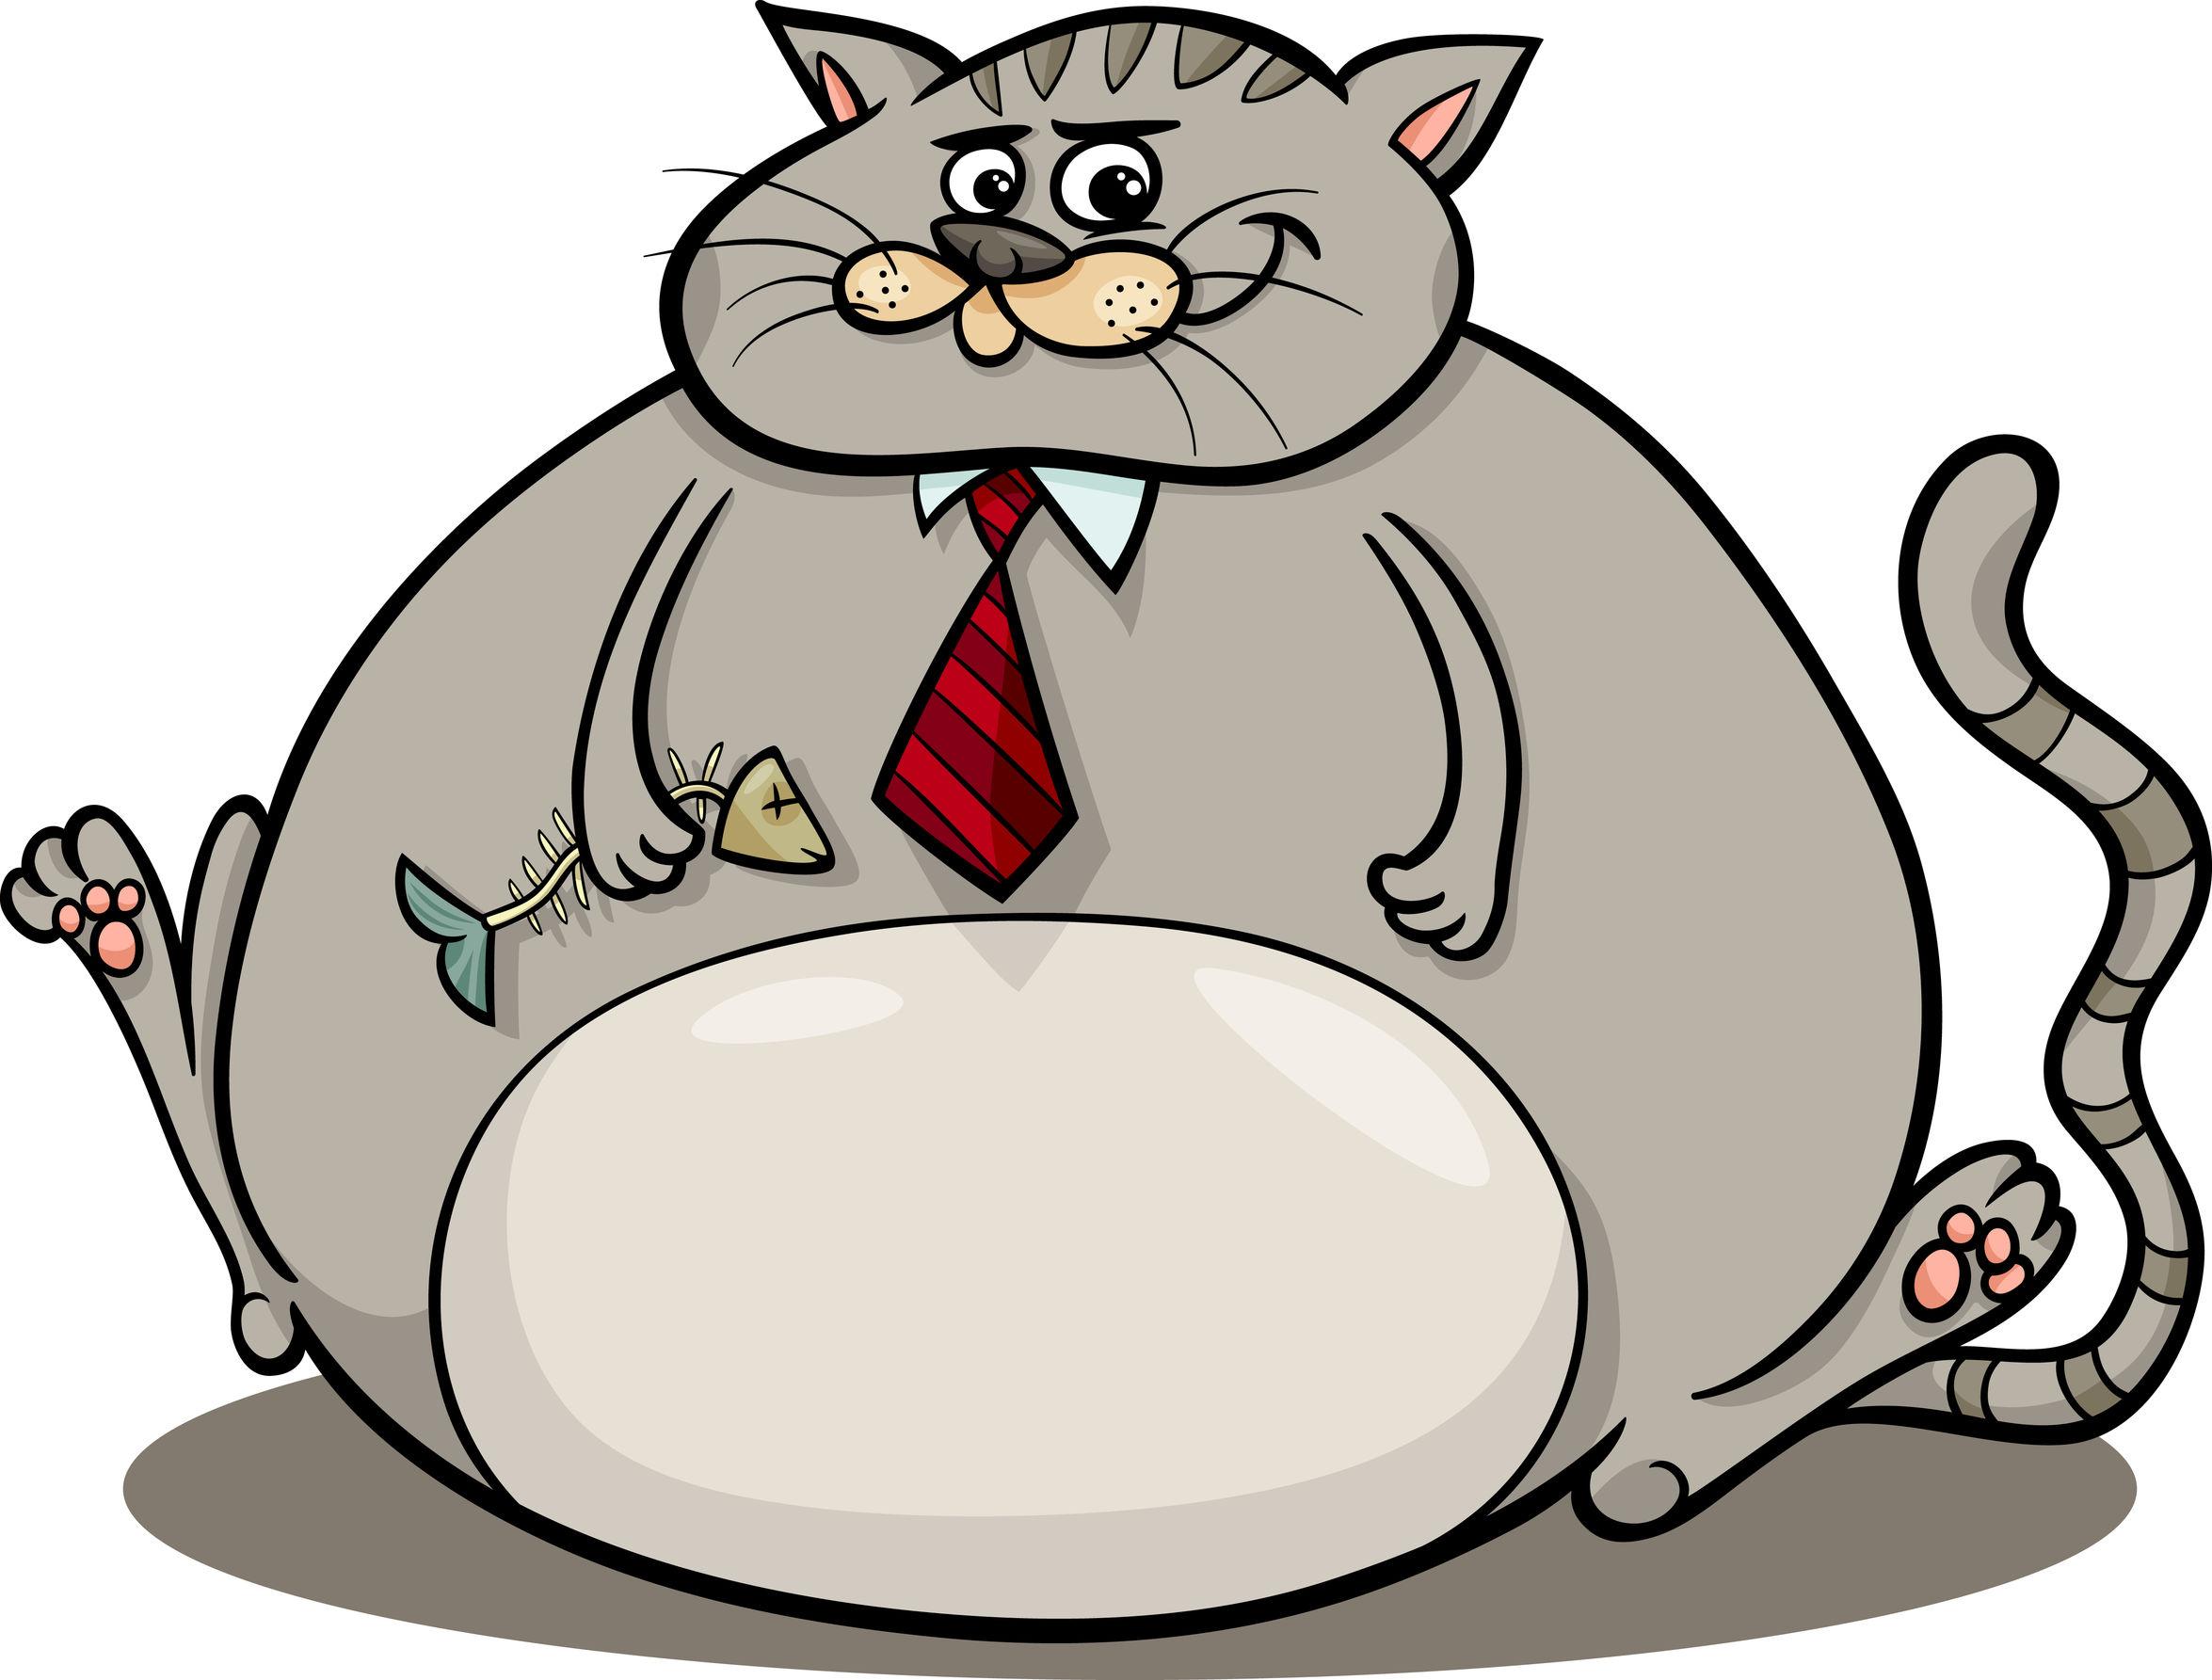 gruby-tłusty-kot-grafika.jpg